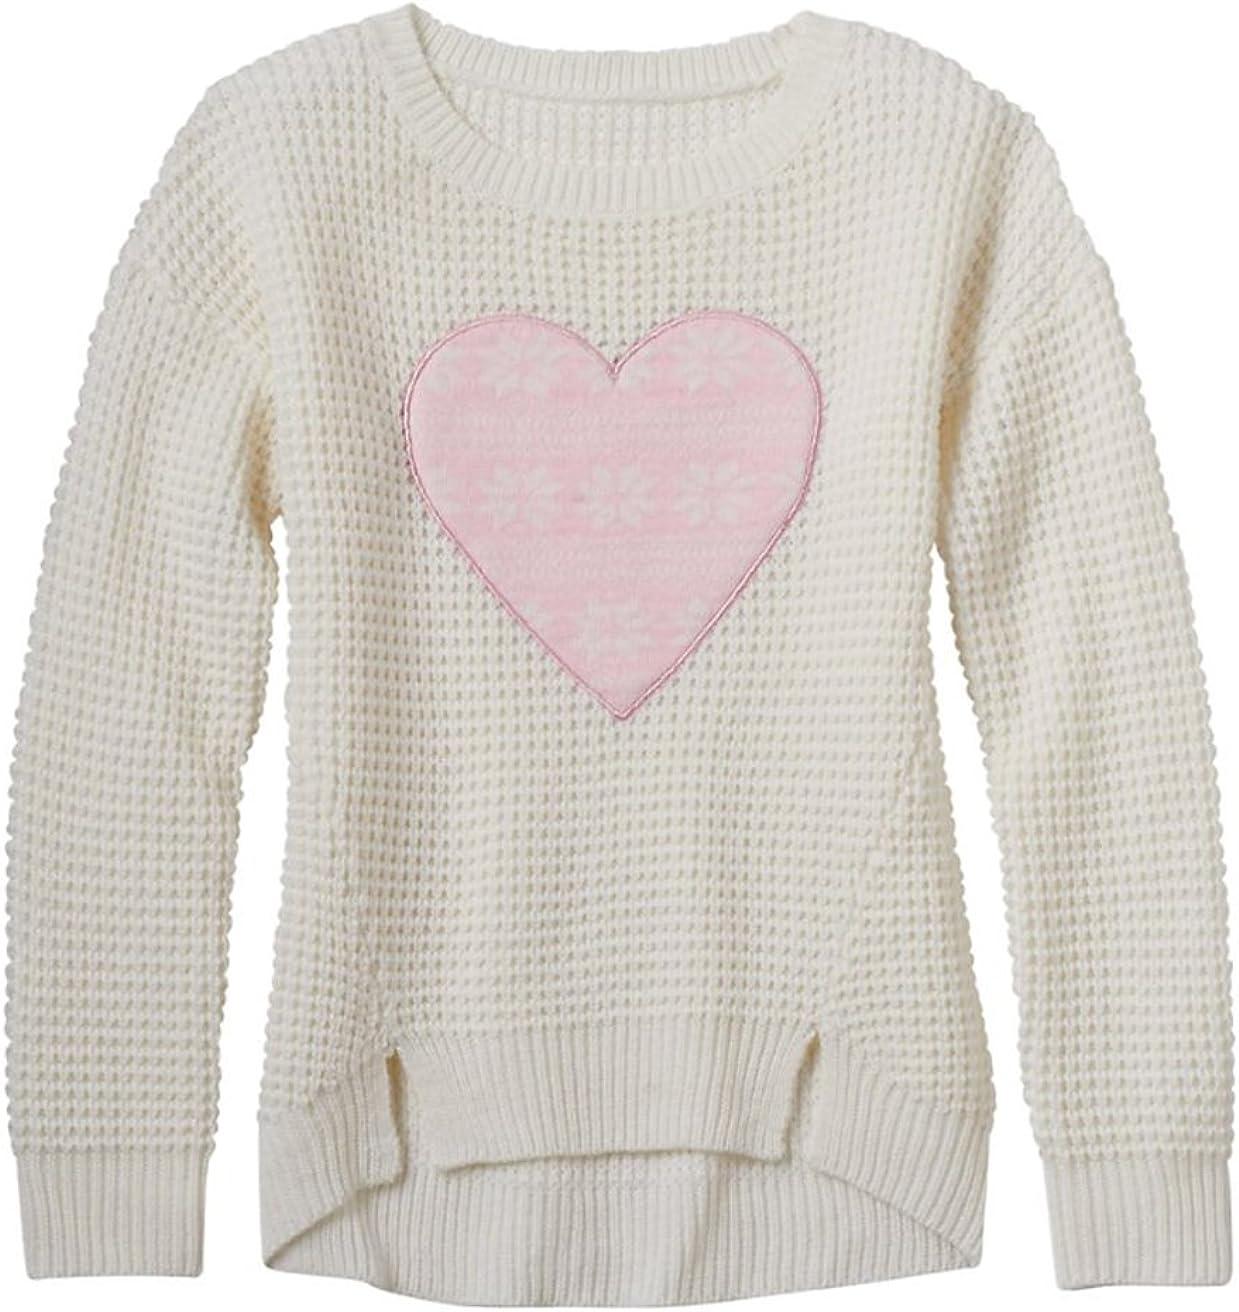 Cream//Pink Sugar Rush Girls Heart Applique Graphic Sweater